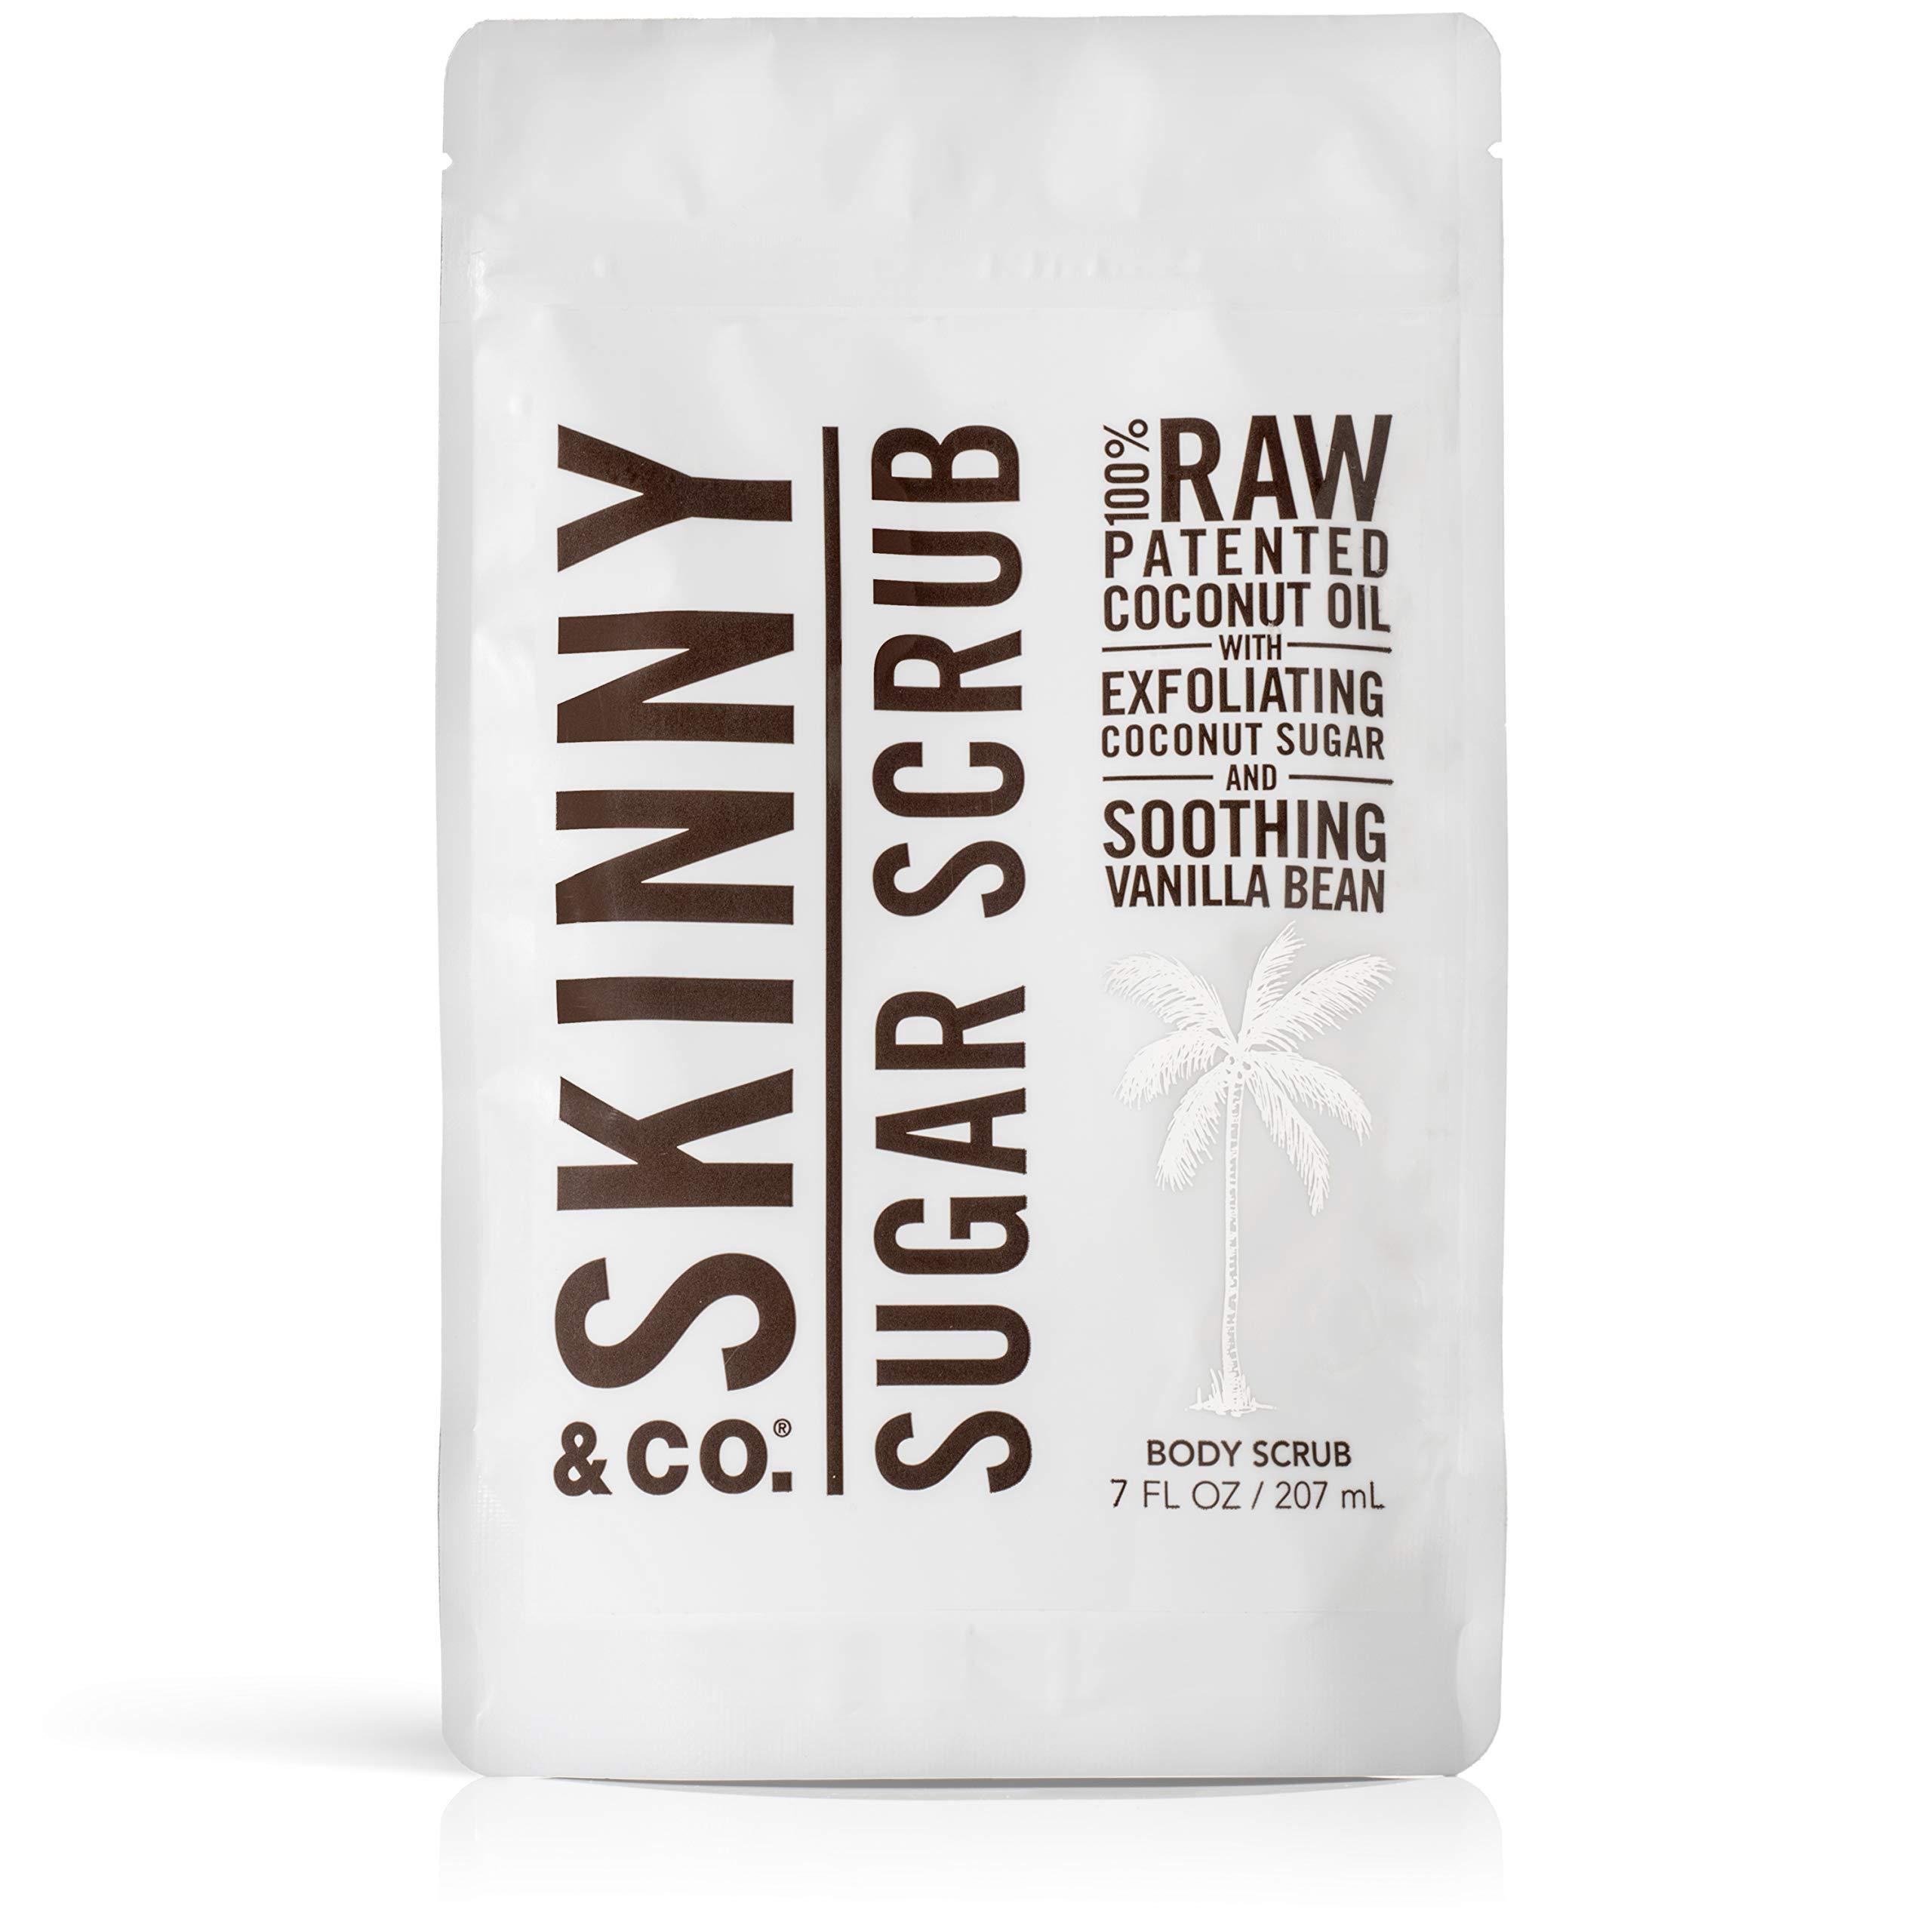 SKINNY & CO. Vanilla Sugar Body Scrub- 100% Raw All Natural Exfoliant Made with Coconut Oil, Coconut Sugar, and Vanilla, Gentle, Moisturizing, Detoxifying, Vitamin Rich, 7 oz.